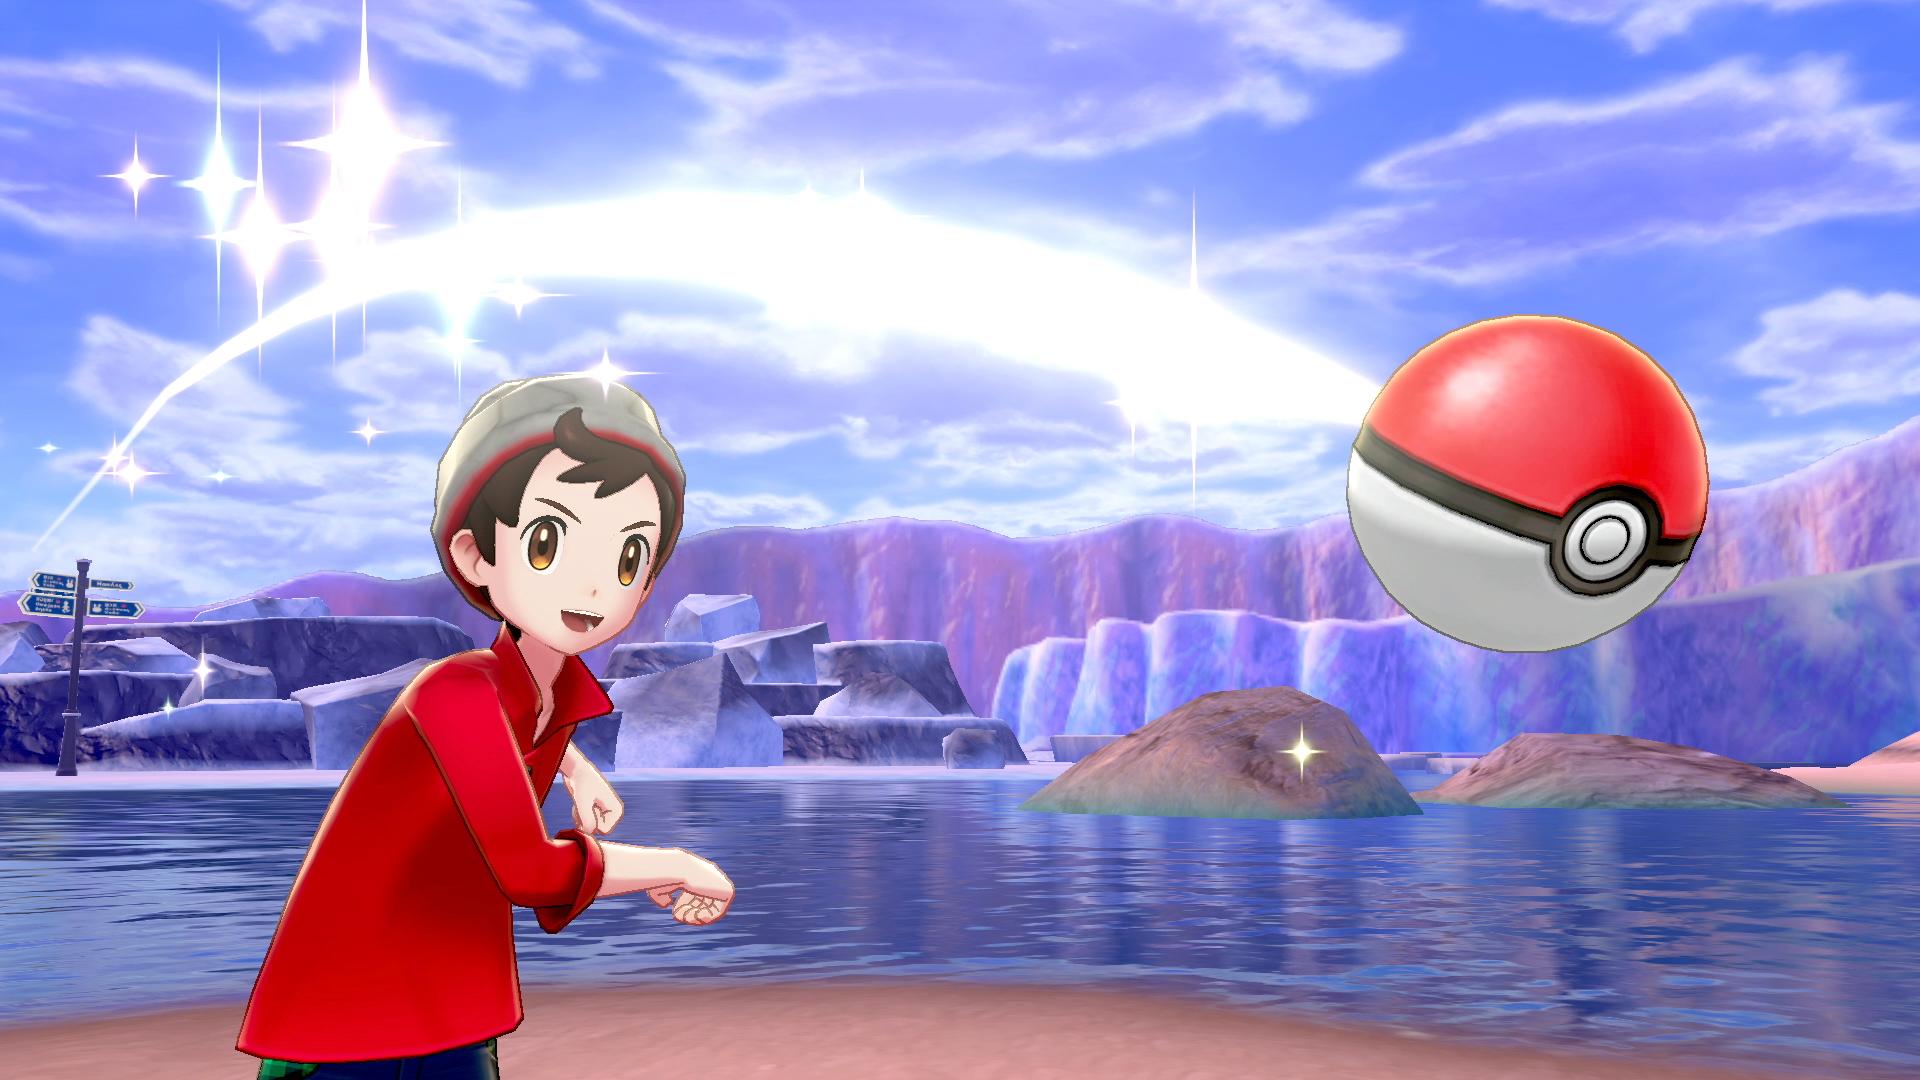 Pokémon Sword and Shield Nintendo Direct coming June 5